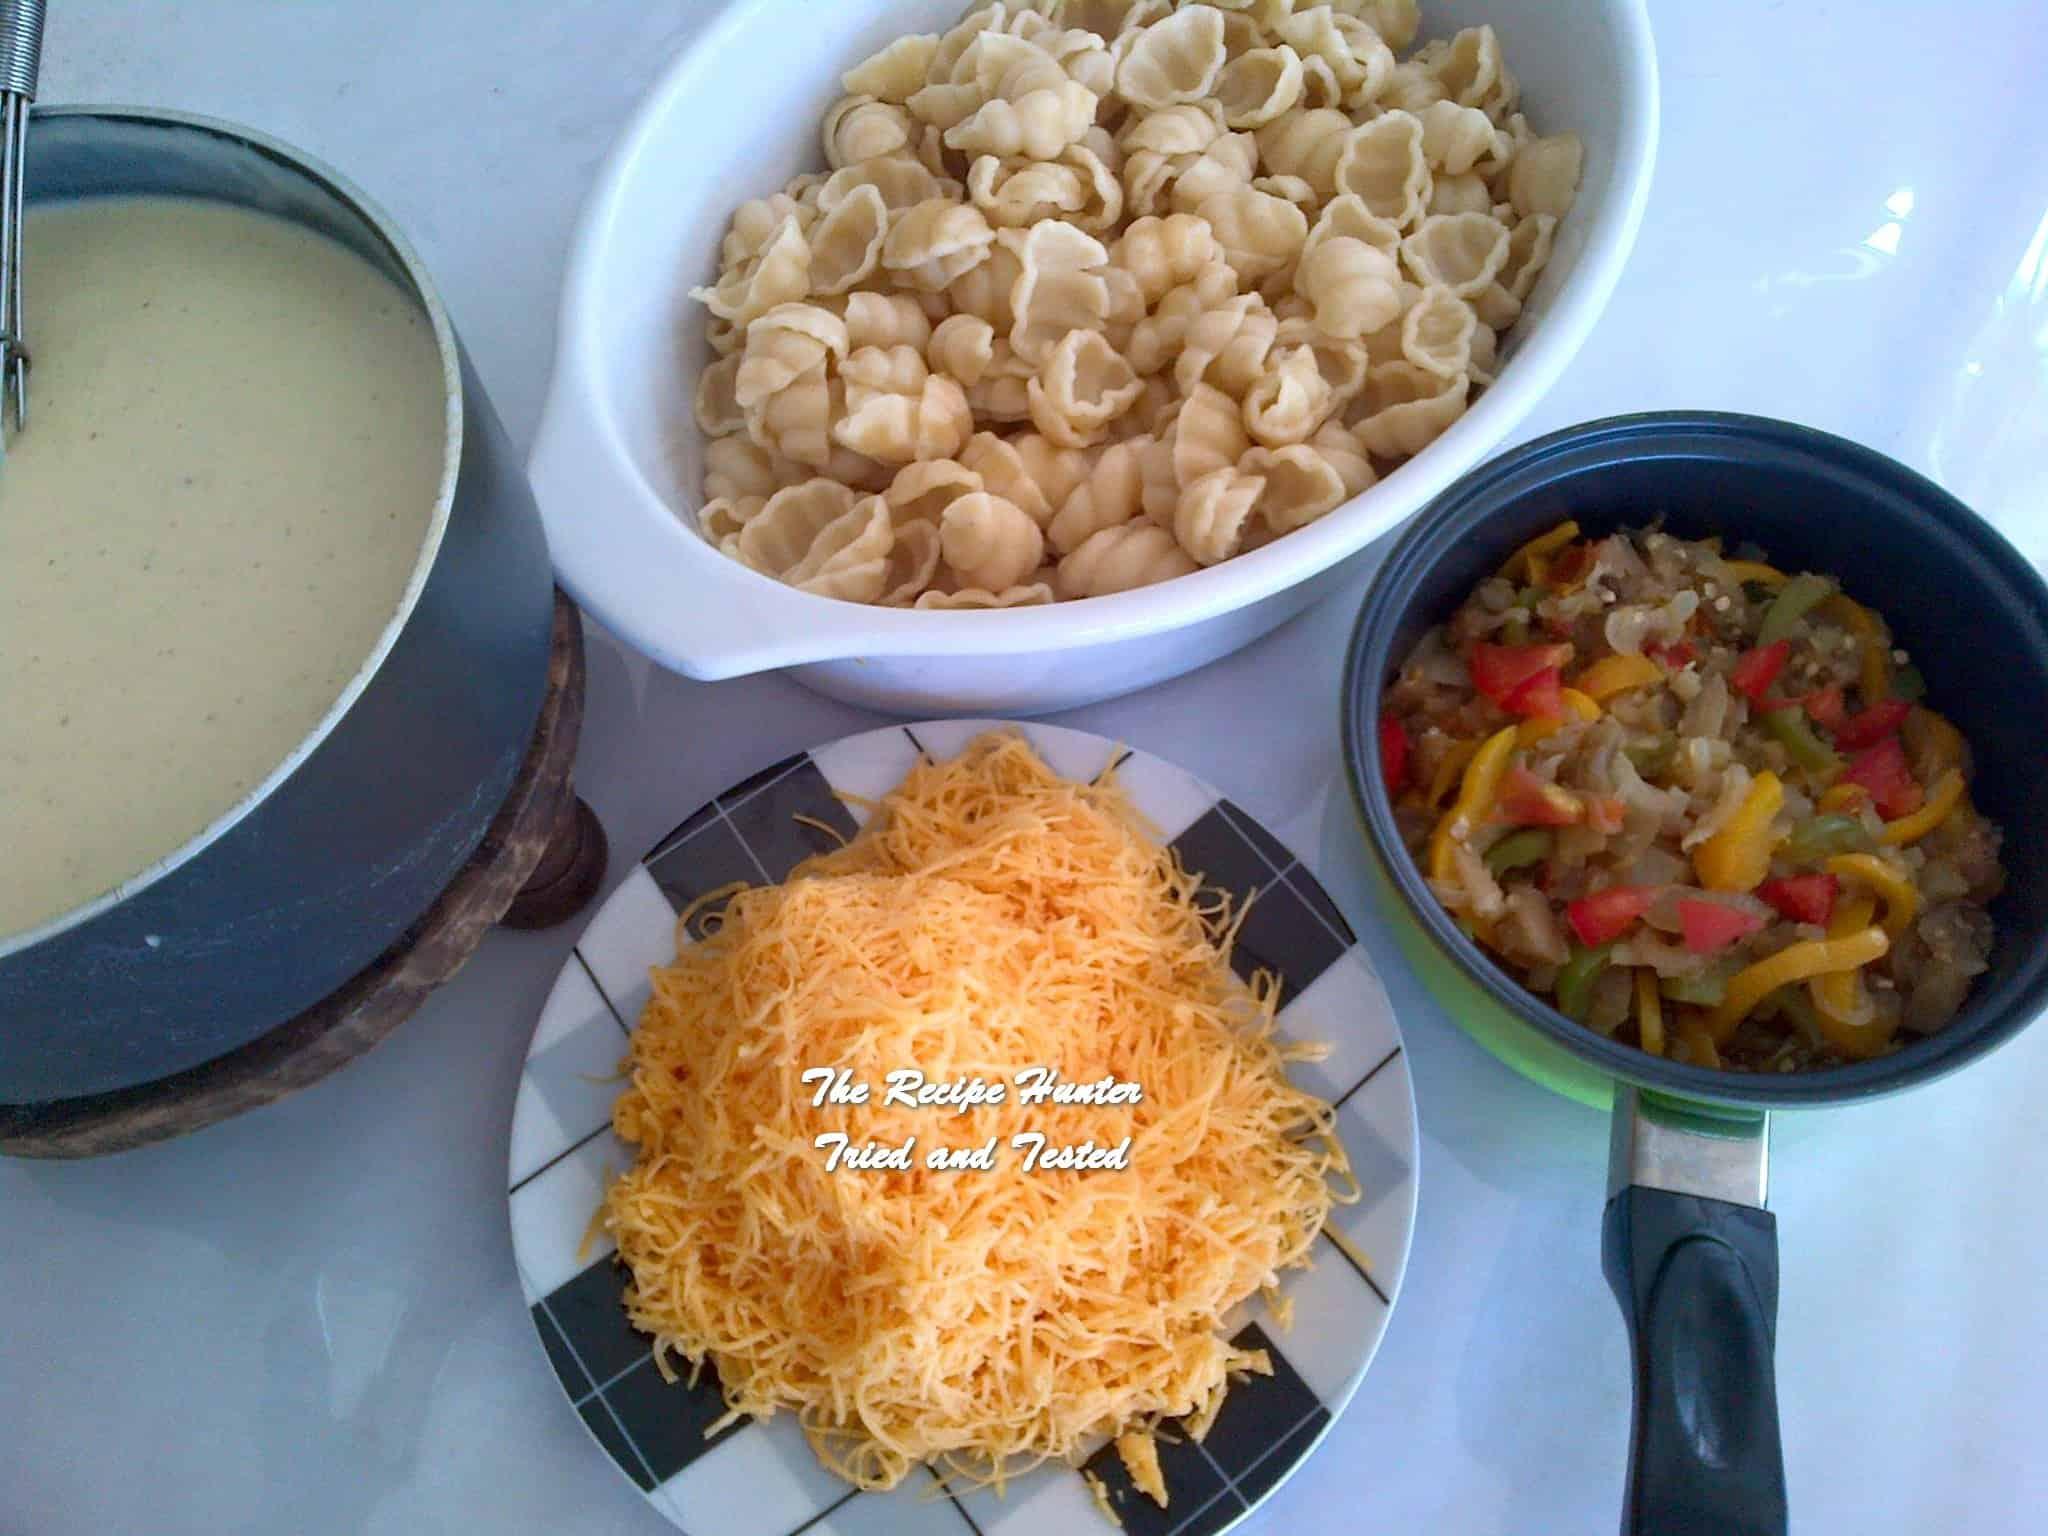 trh-nazleys-simplicity-cheesy-creamy-maccheese1